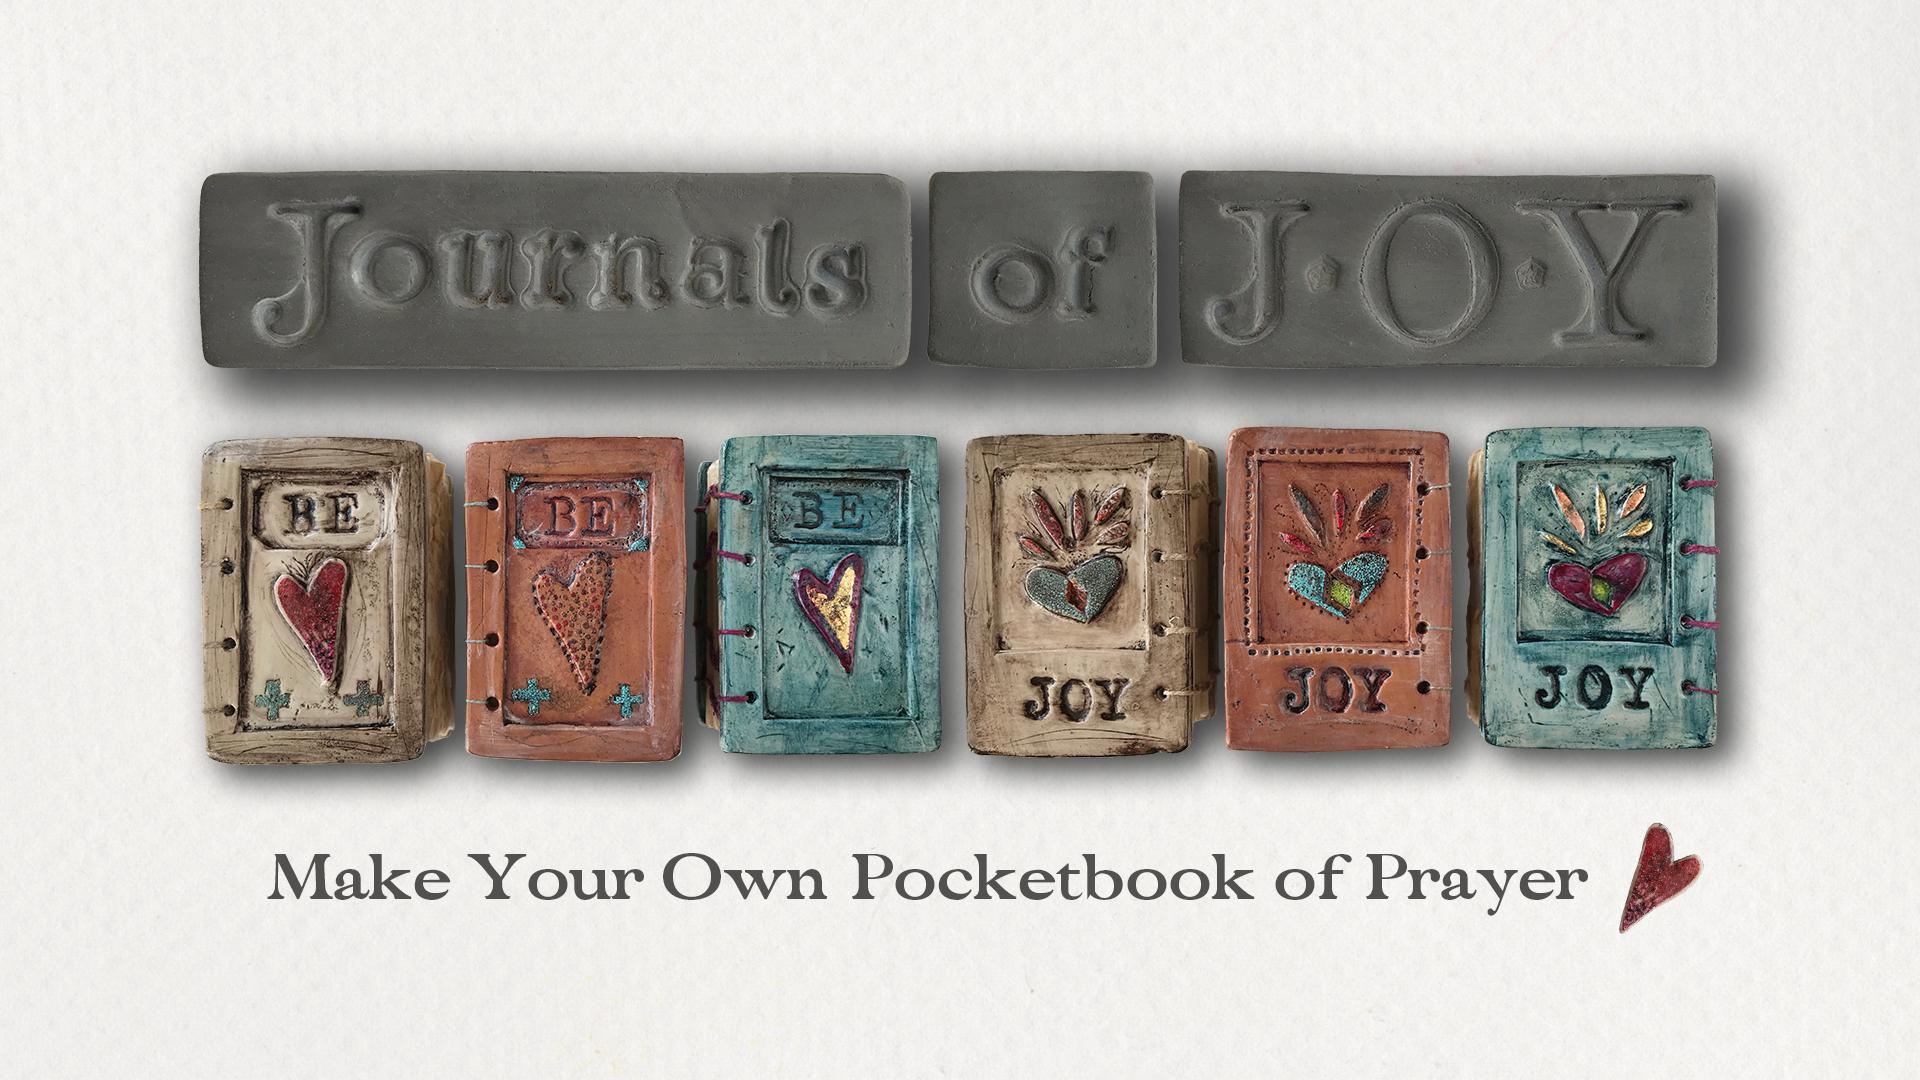 journals-of-joy-prayer-books.jpg